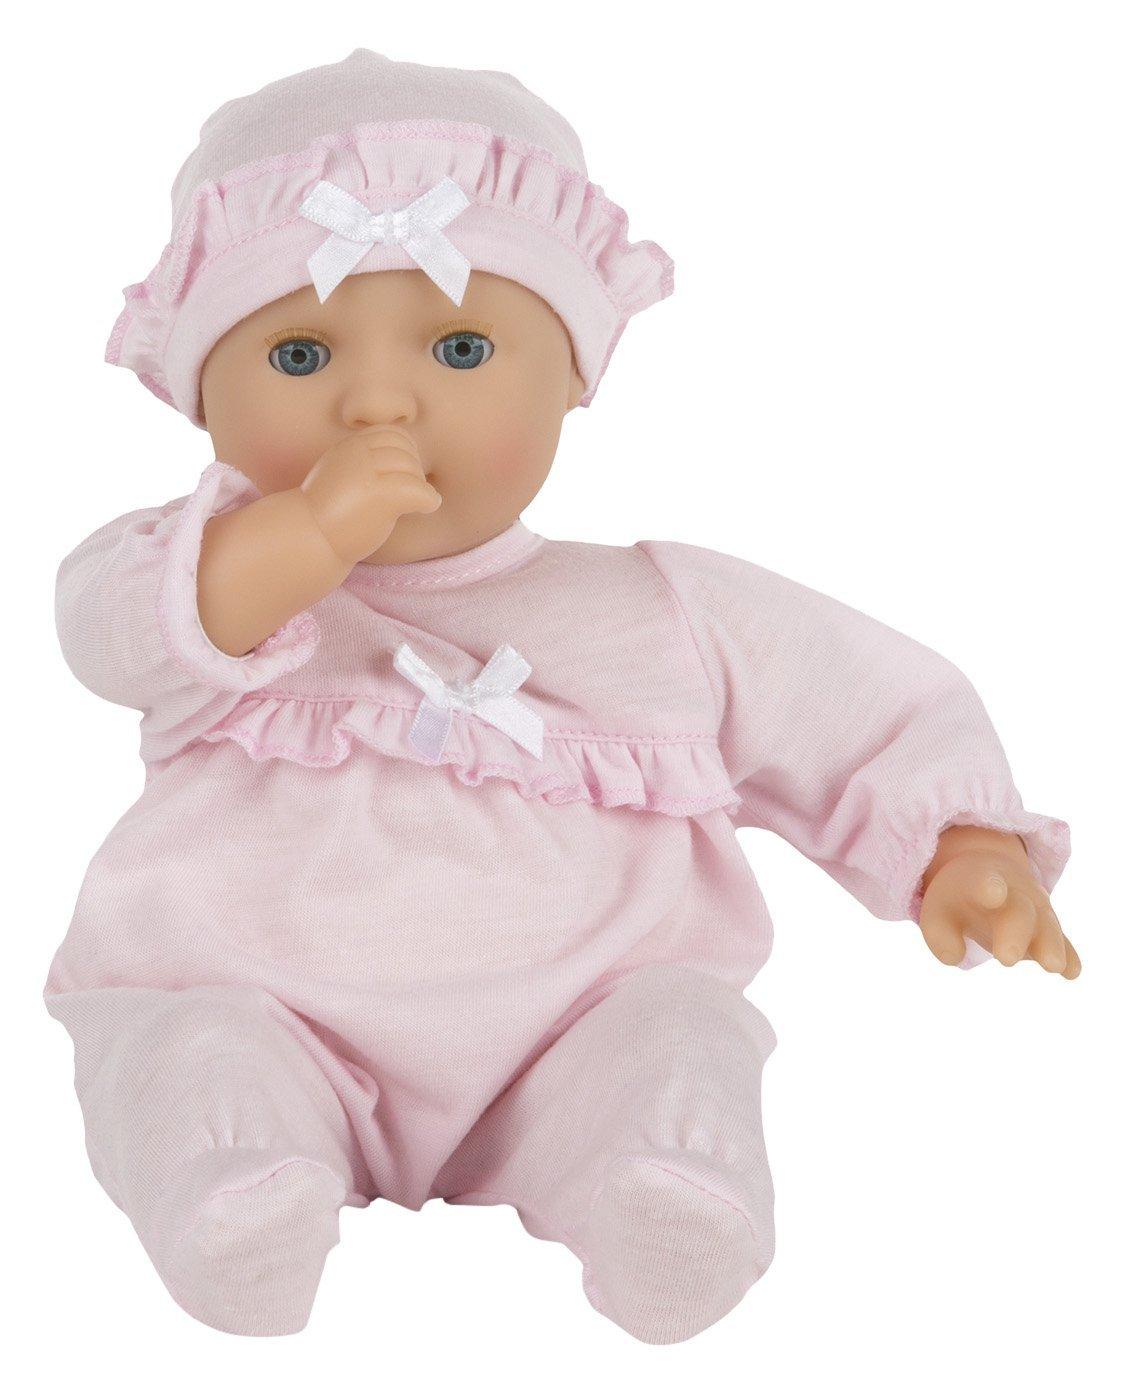 And Doug Doll Melissa Dolls 24 Beds